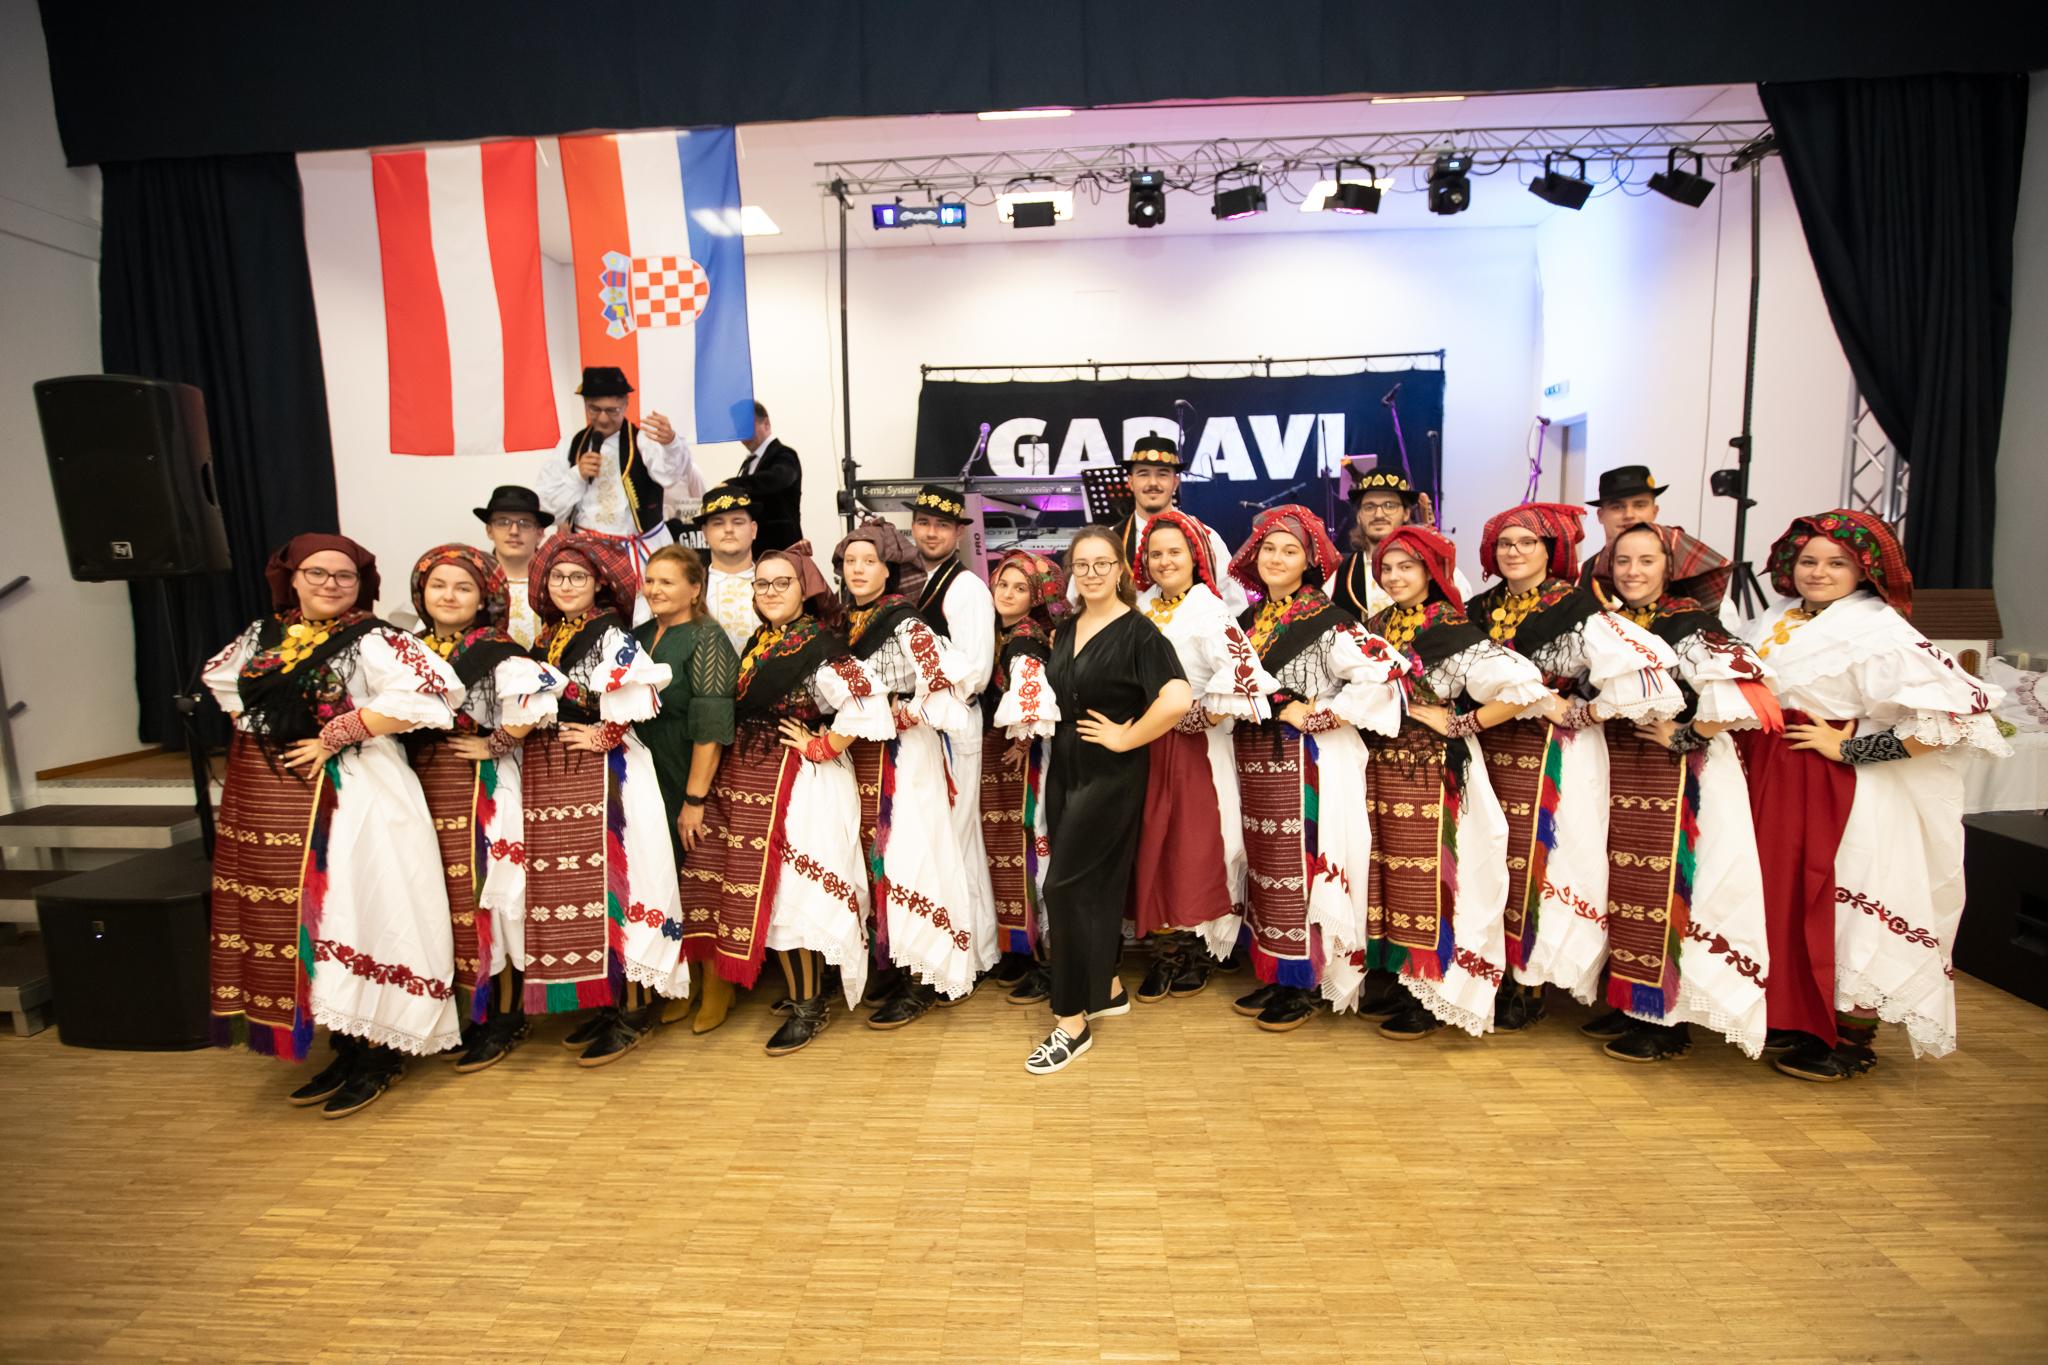 4. Slavonska večer u organizaciji KUD-a Tkanica Linz – foto galerija